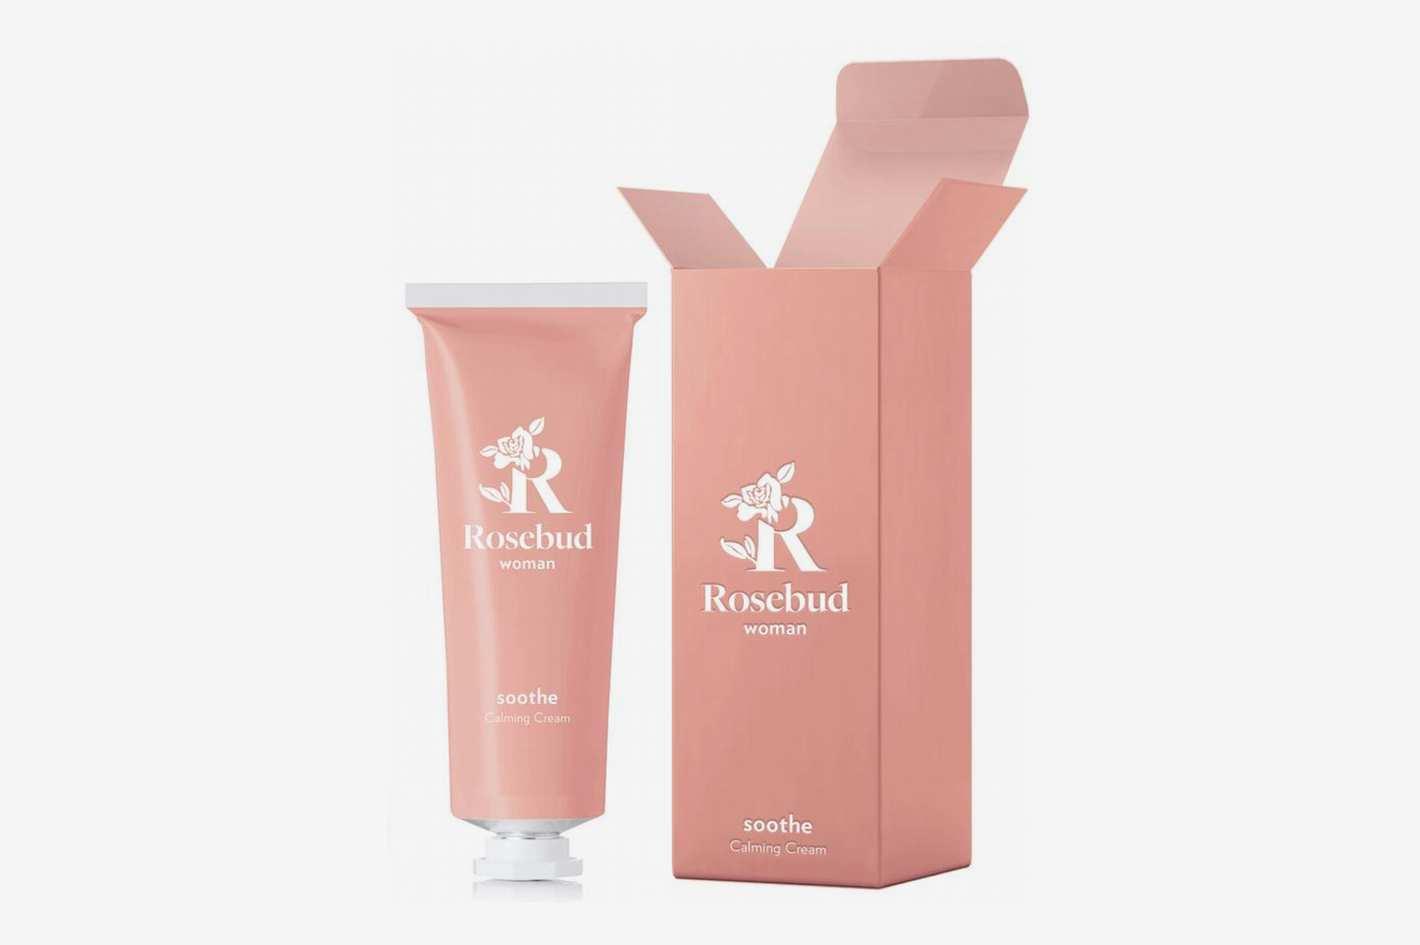 Rosebud Woman Soothe: Calming Cream